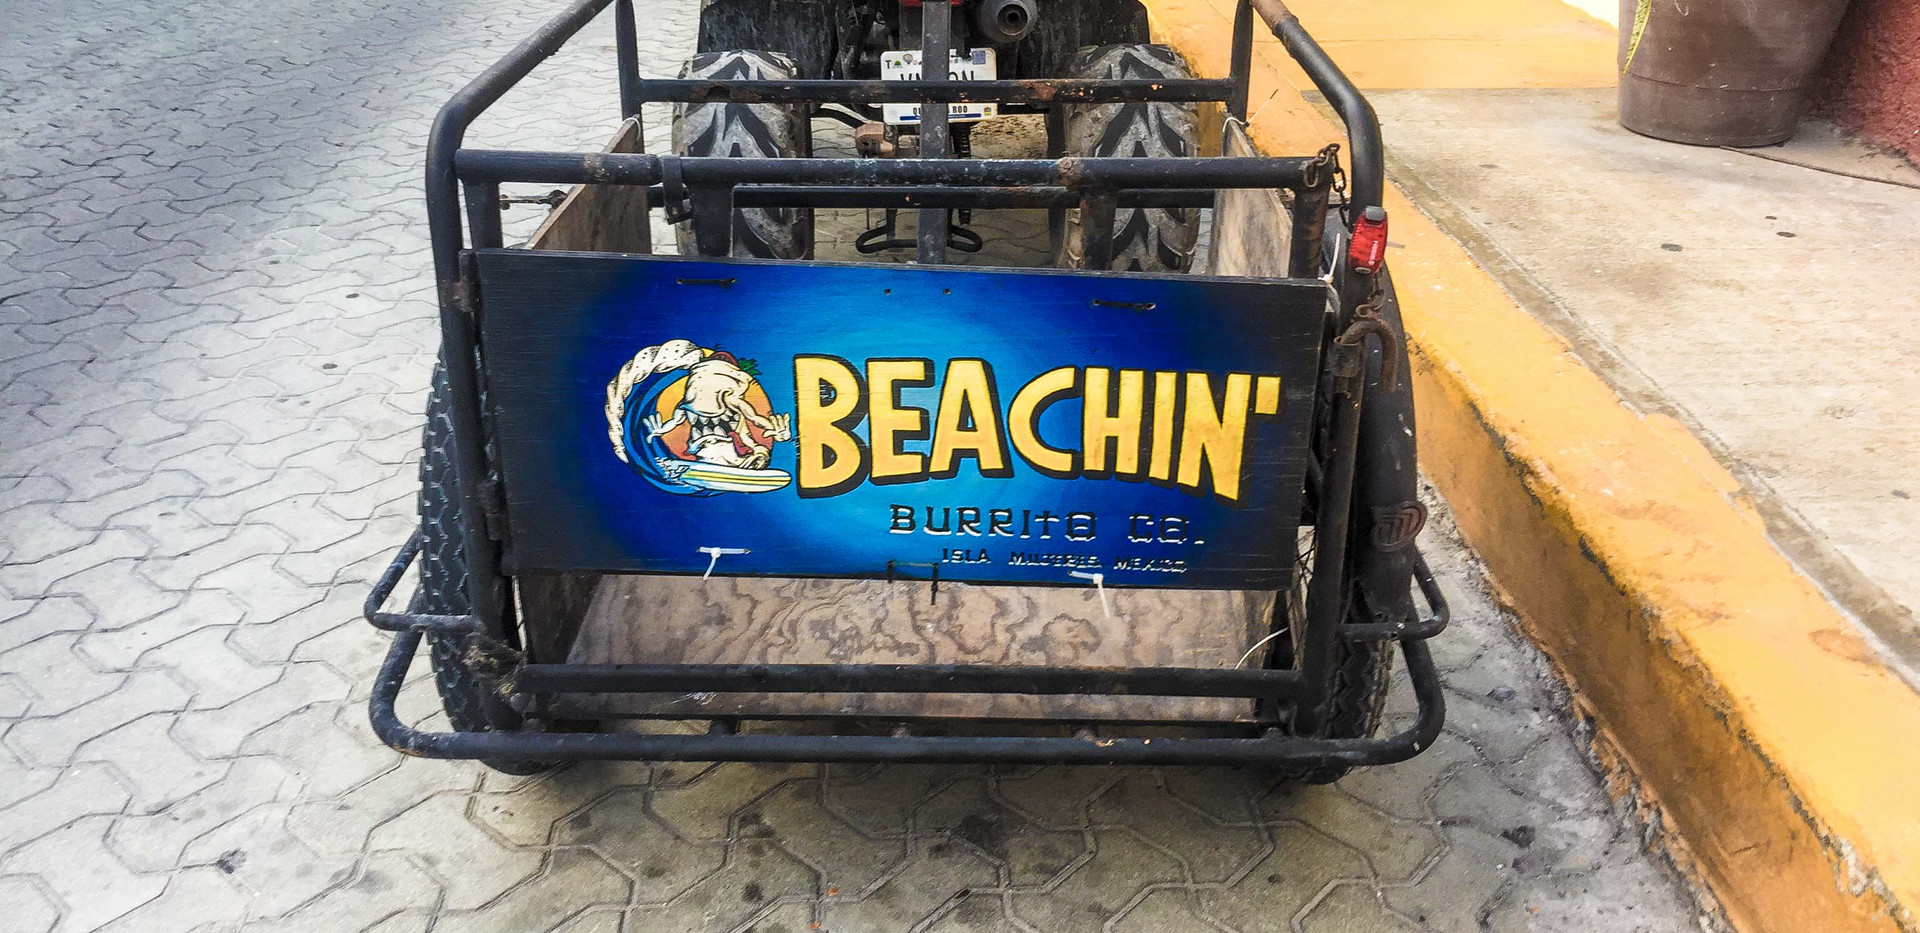 BeachinBurrito22-tasteofisla-islamujeres